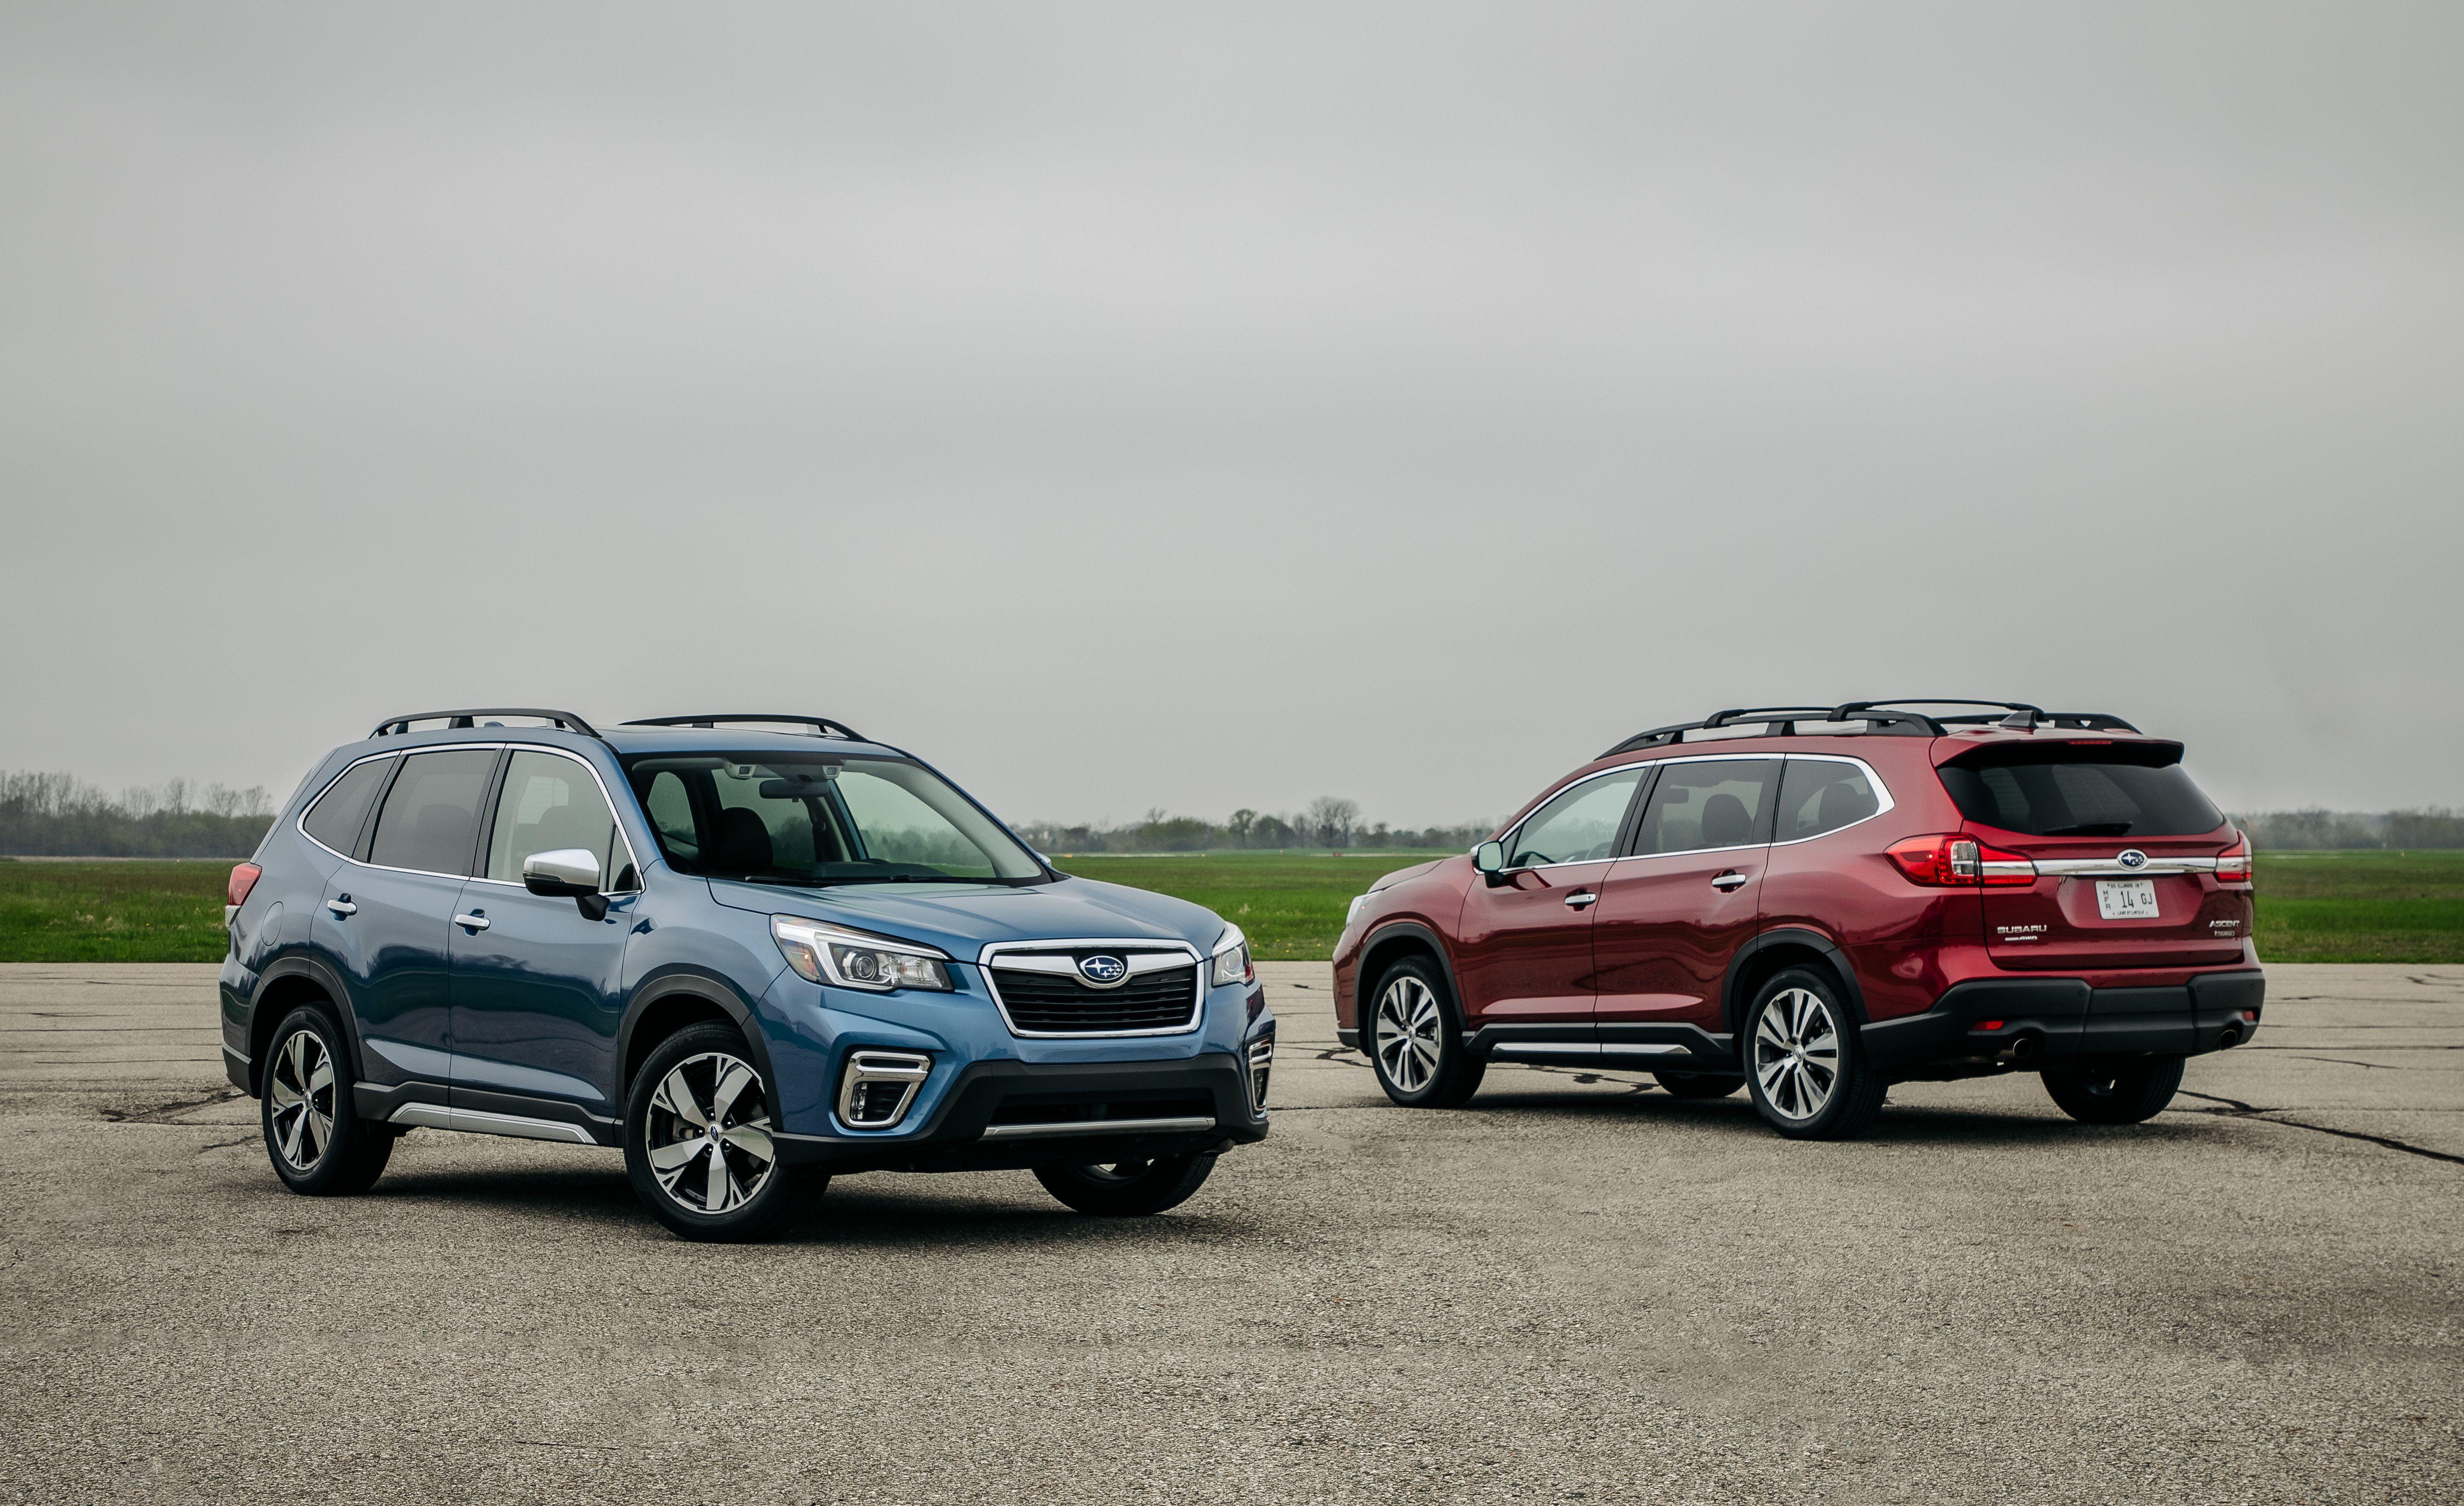 2019 Subaru Ascent Vs 2019 Subaru Forester